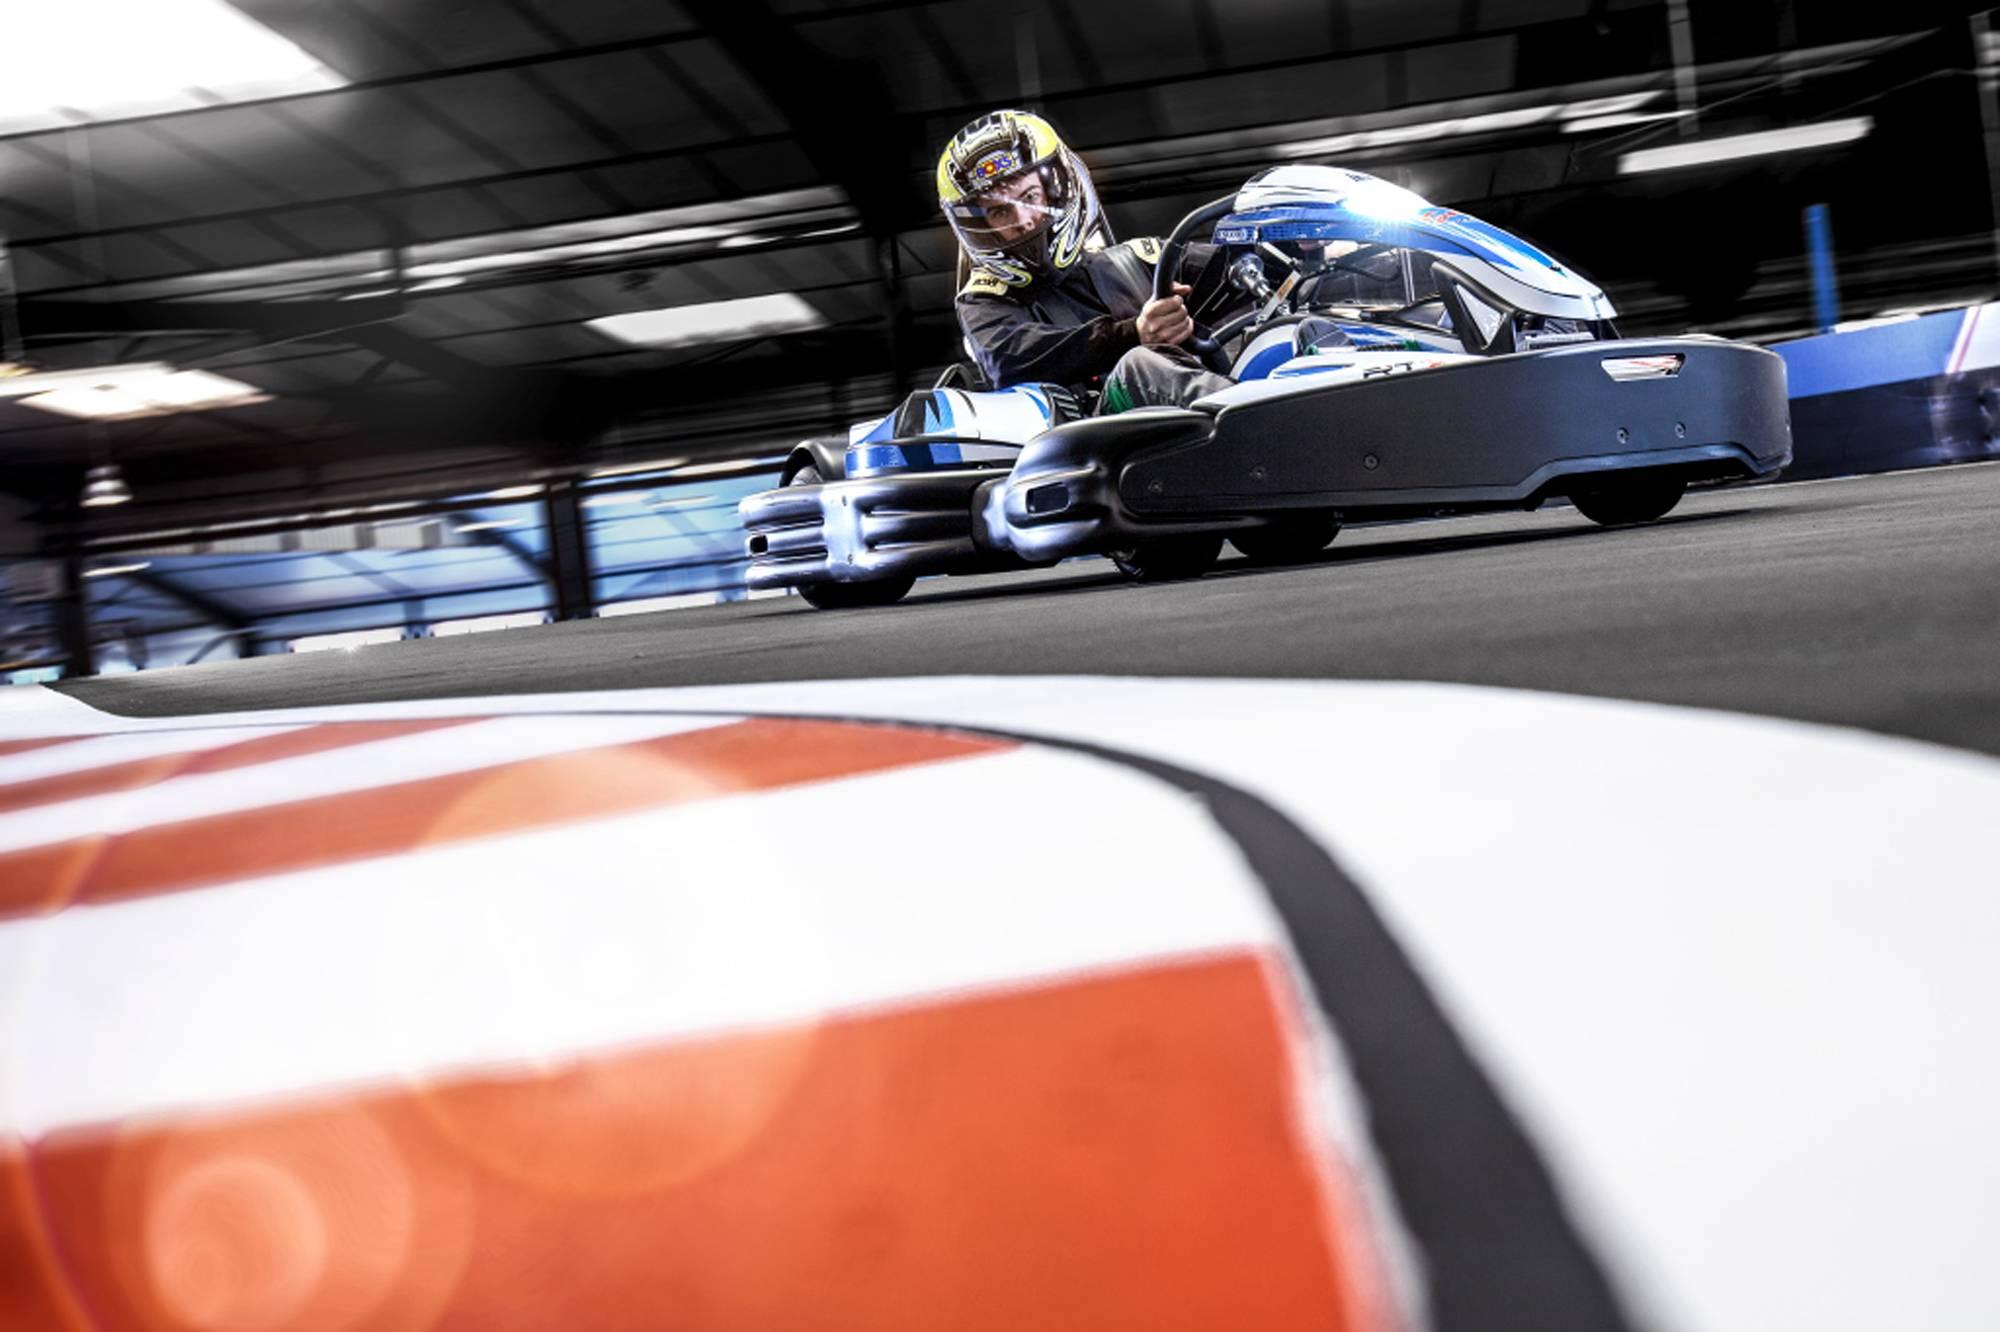 choisir karting indoor plutôt que karting outdoor à lyon